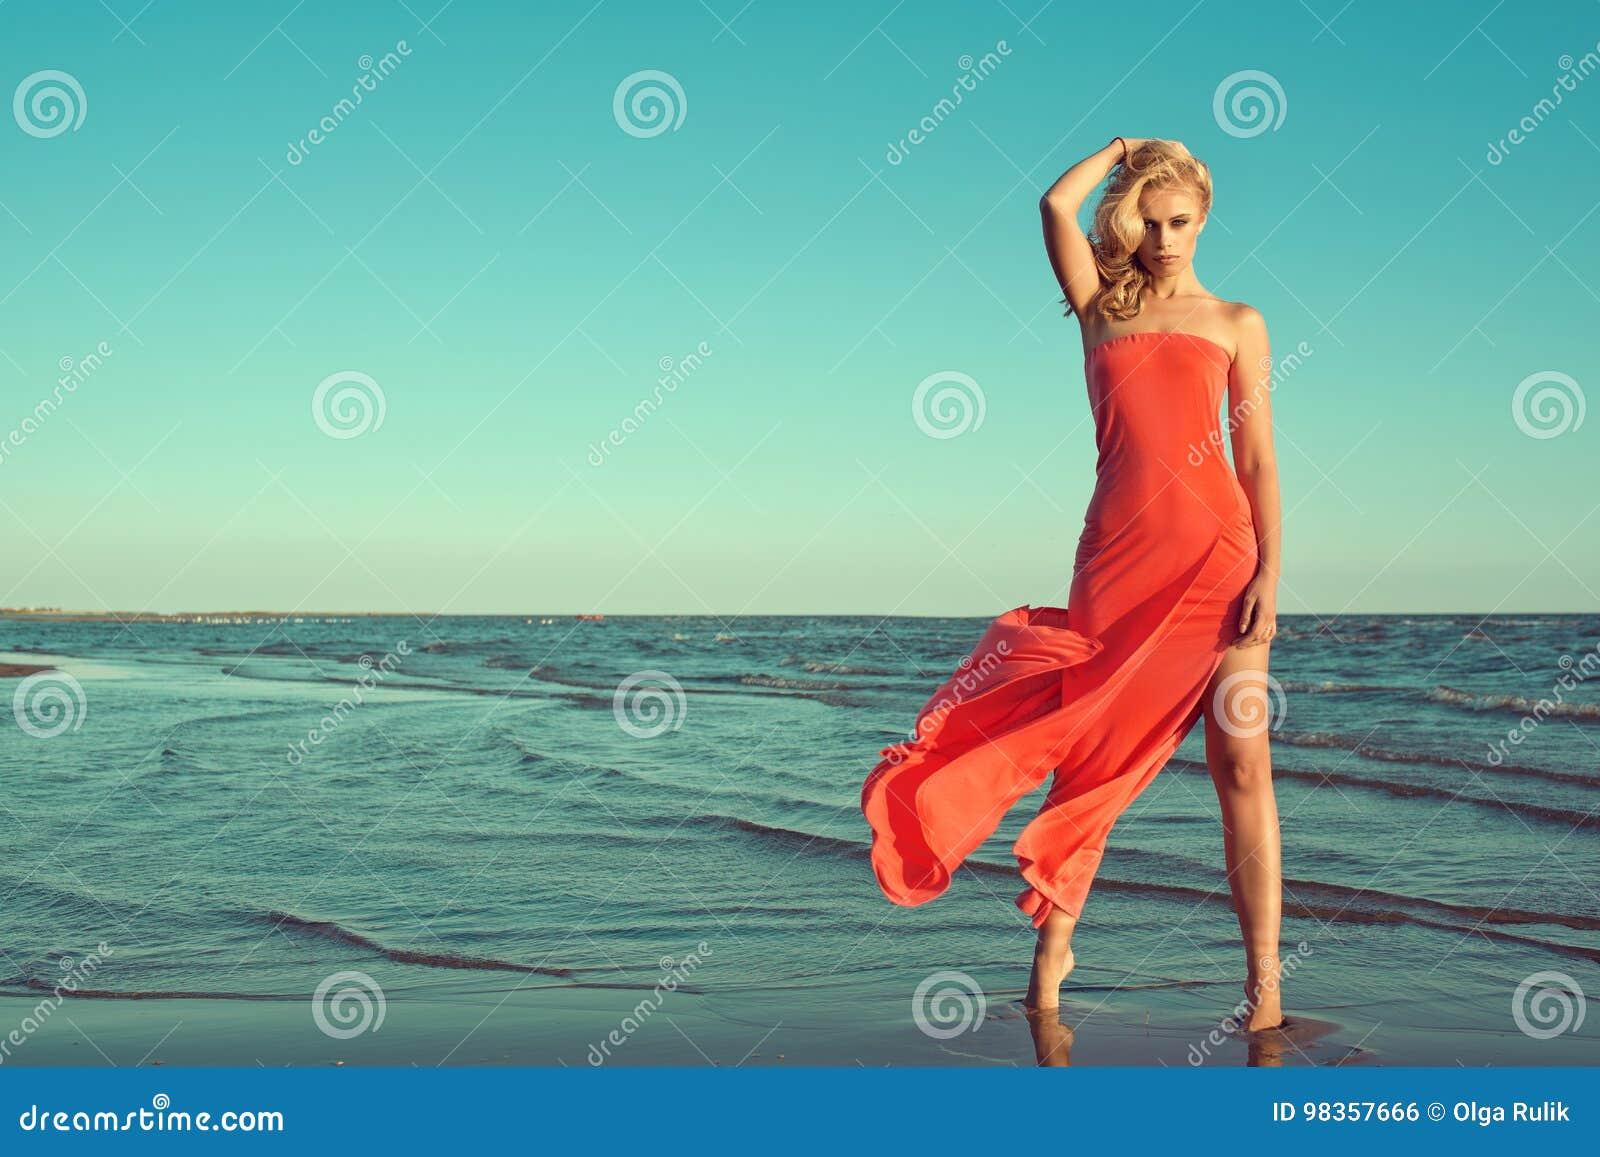 f218bb7394c2 Πανέμορφο προκλητικό λεπτό ξανθό πρότυπο στο κόκκινο στράπλες φόρεμα με το  πετώντας τραίνο που στέκεται tiptoe